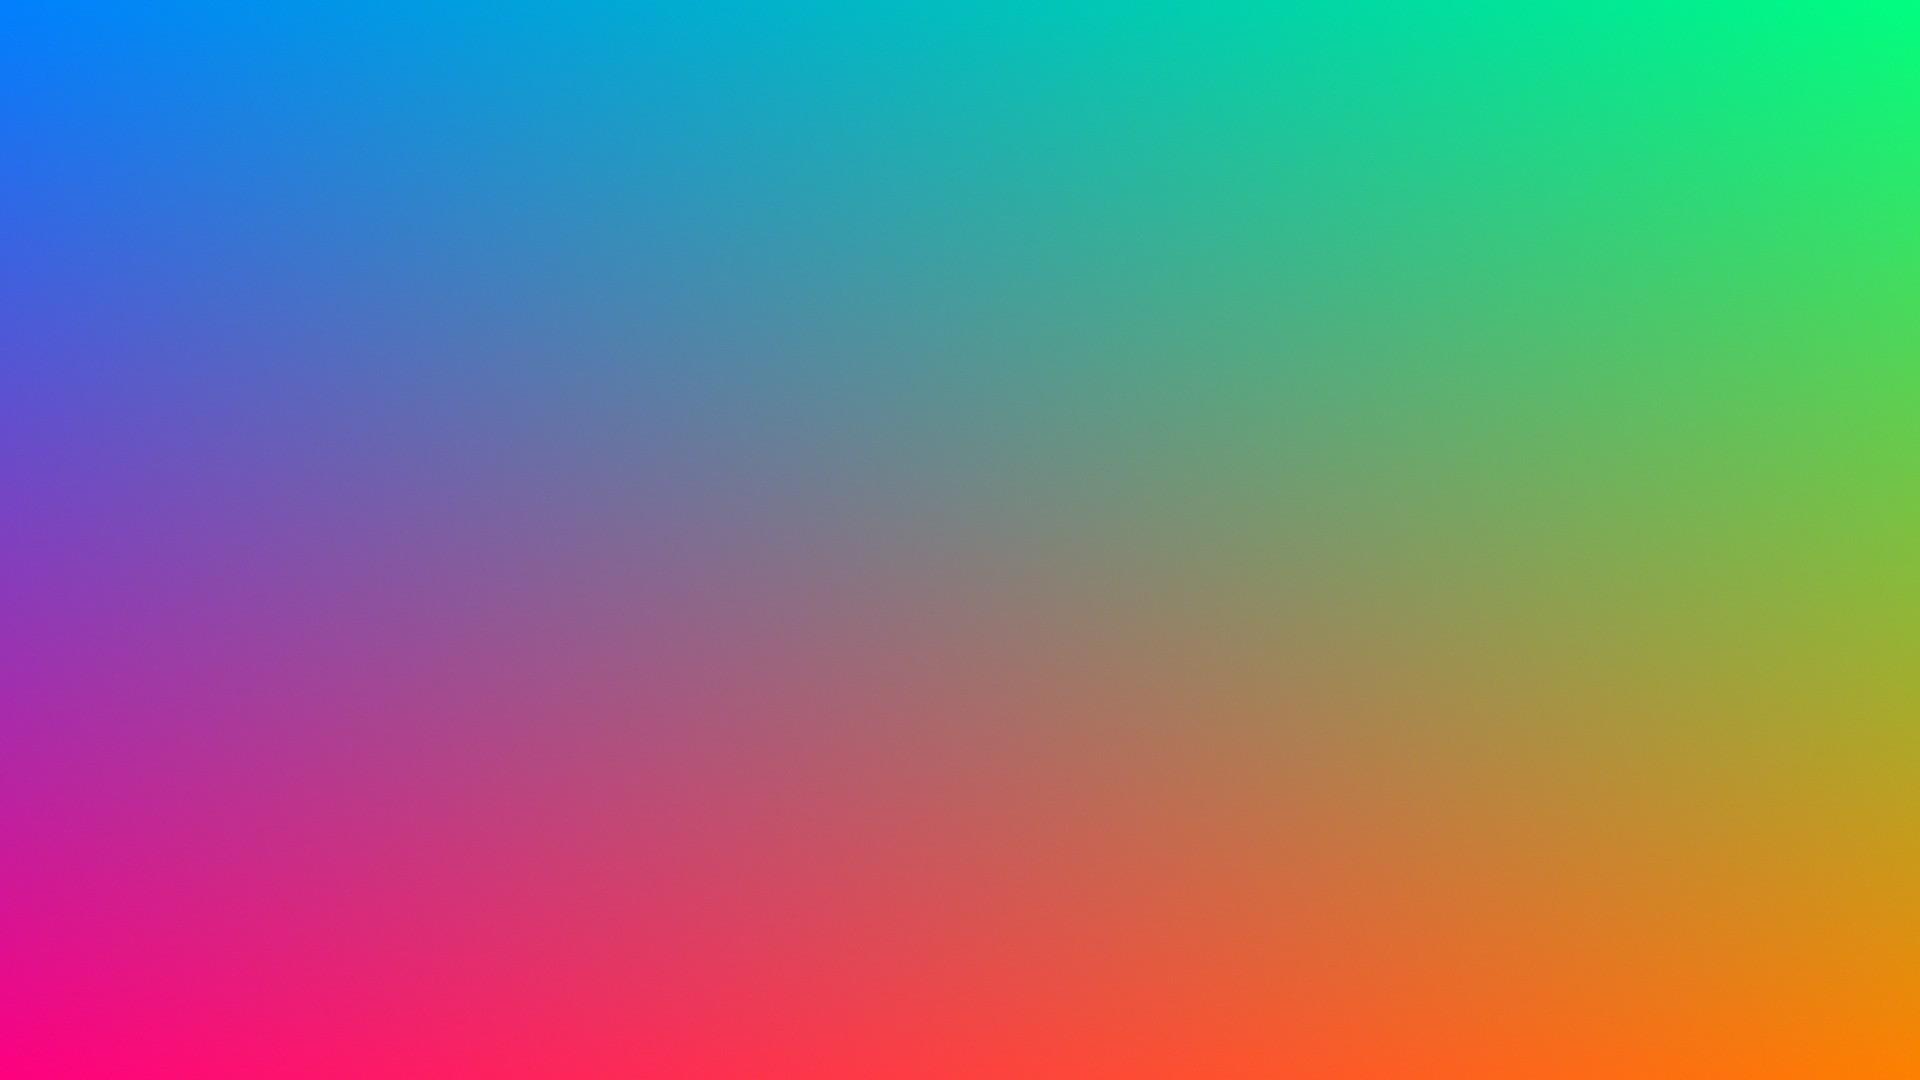 Translucent full screen hd wallpaper